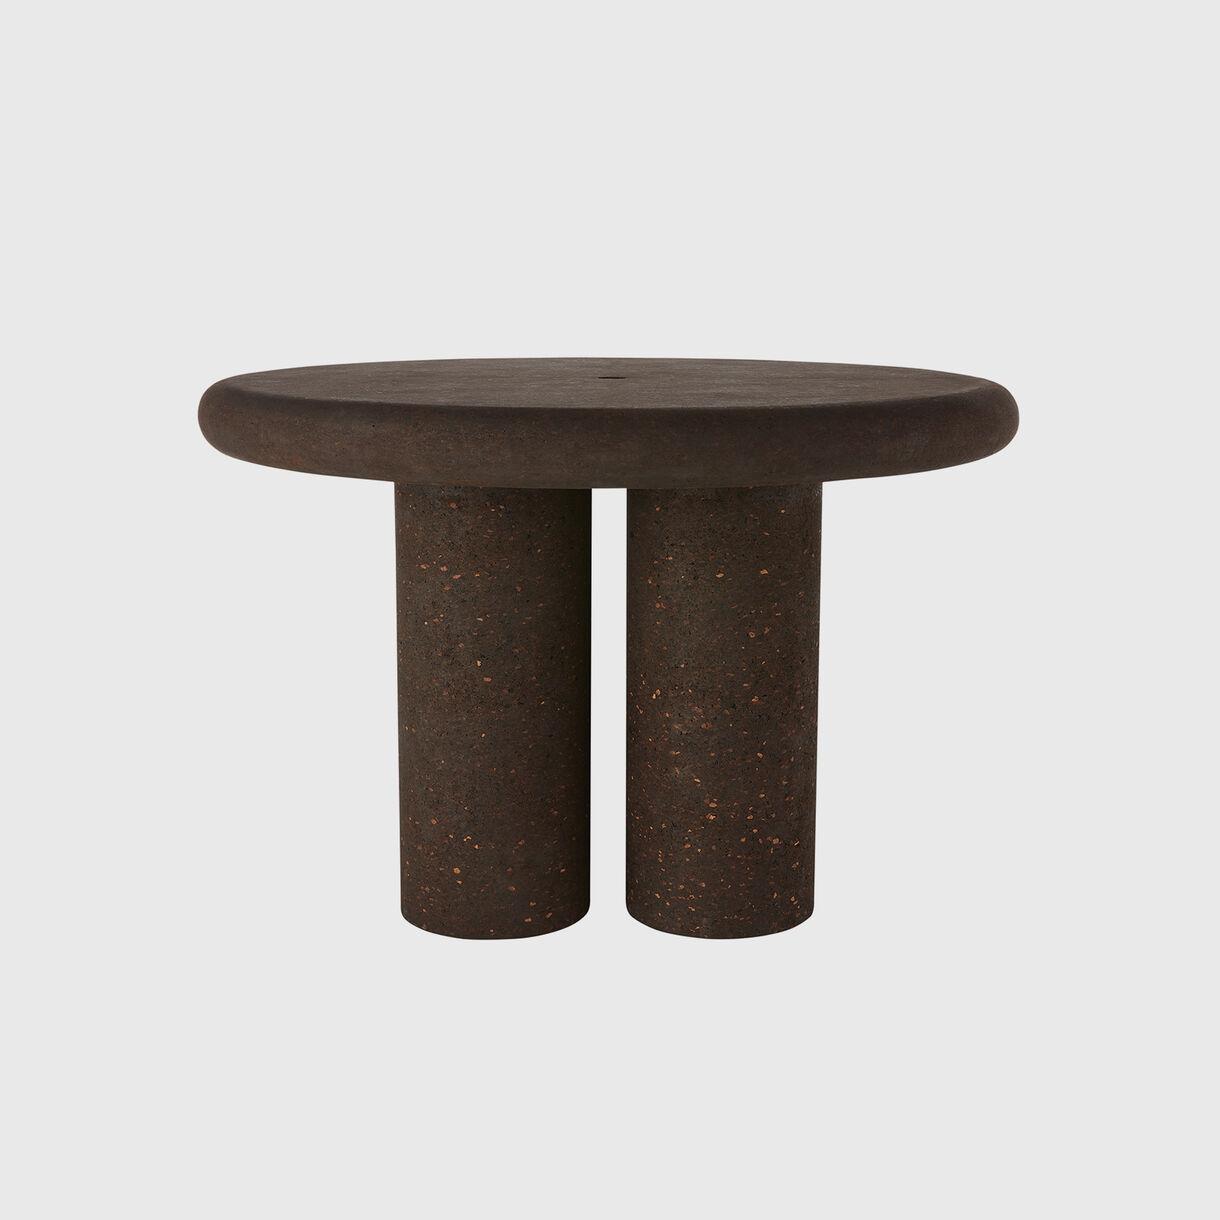 Cork Round Table, 1200mm